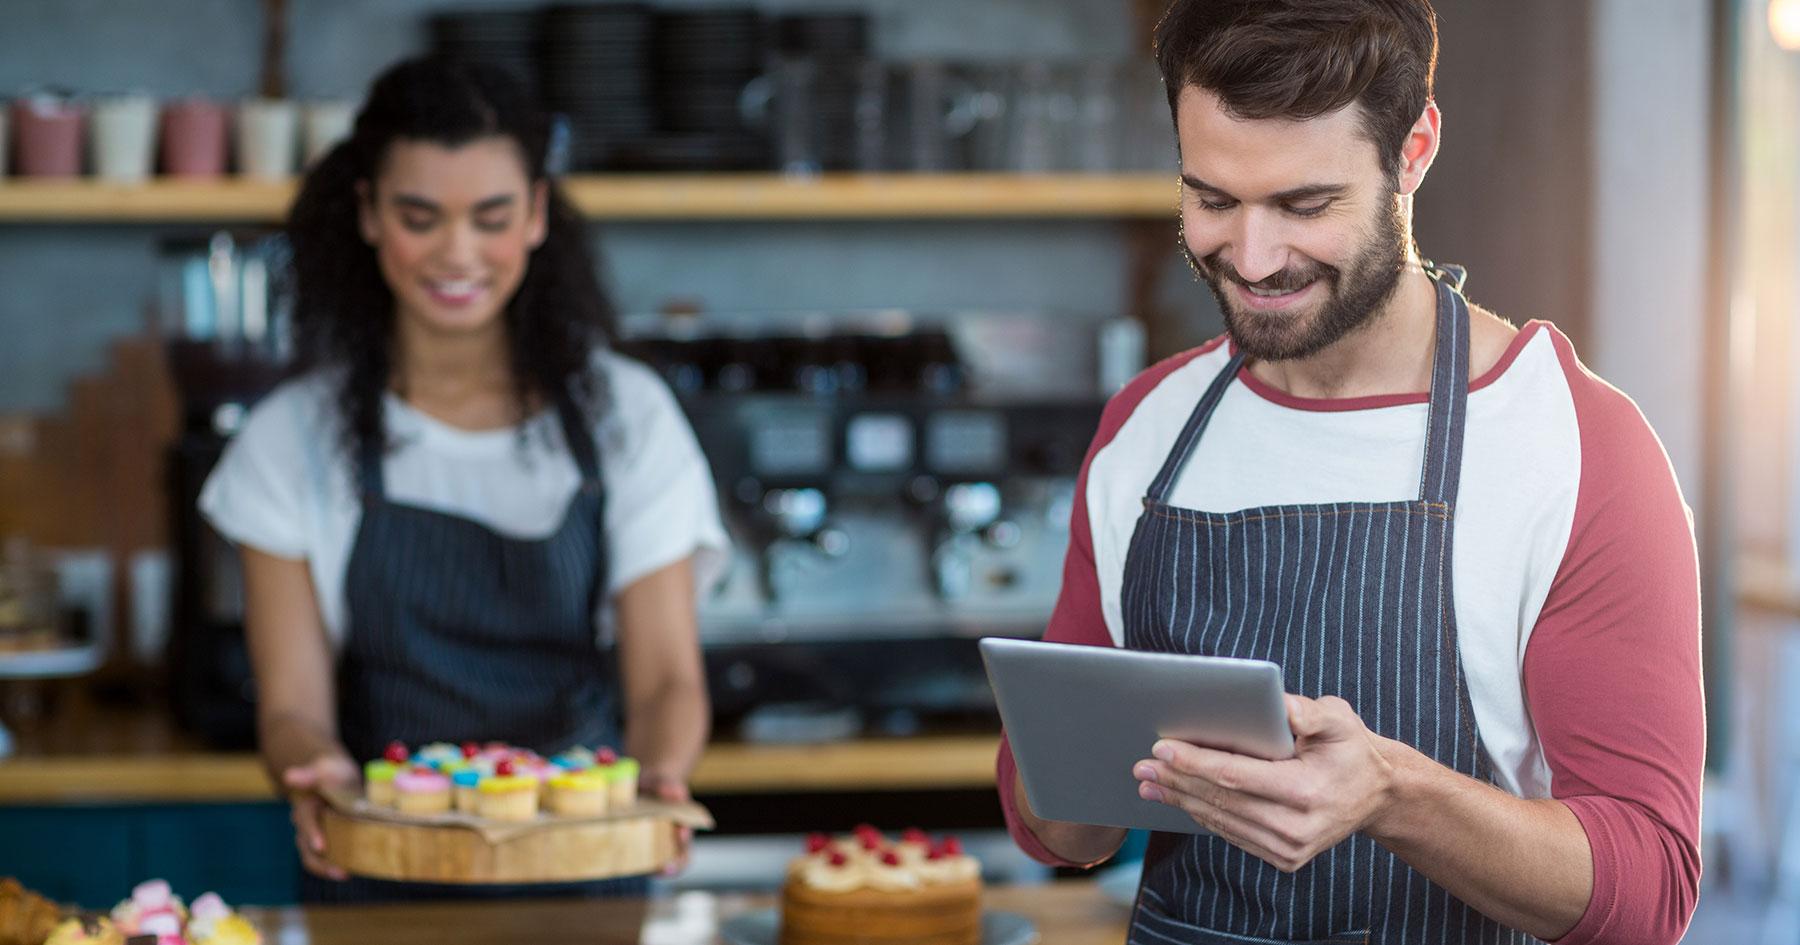 Enhance Restaurant Efficiency With System Integration